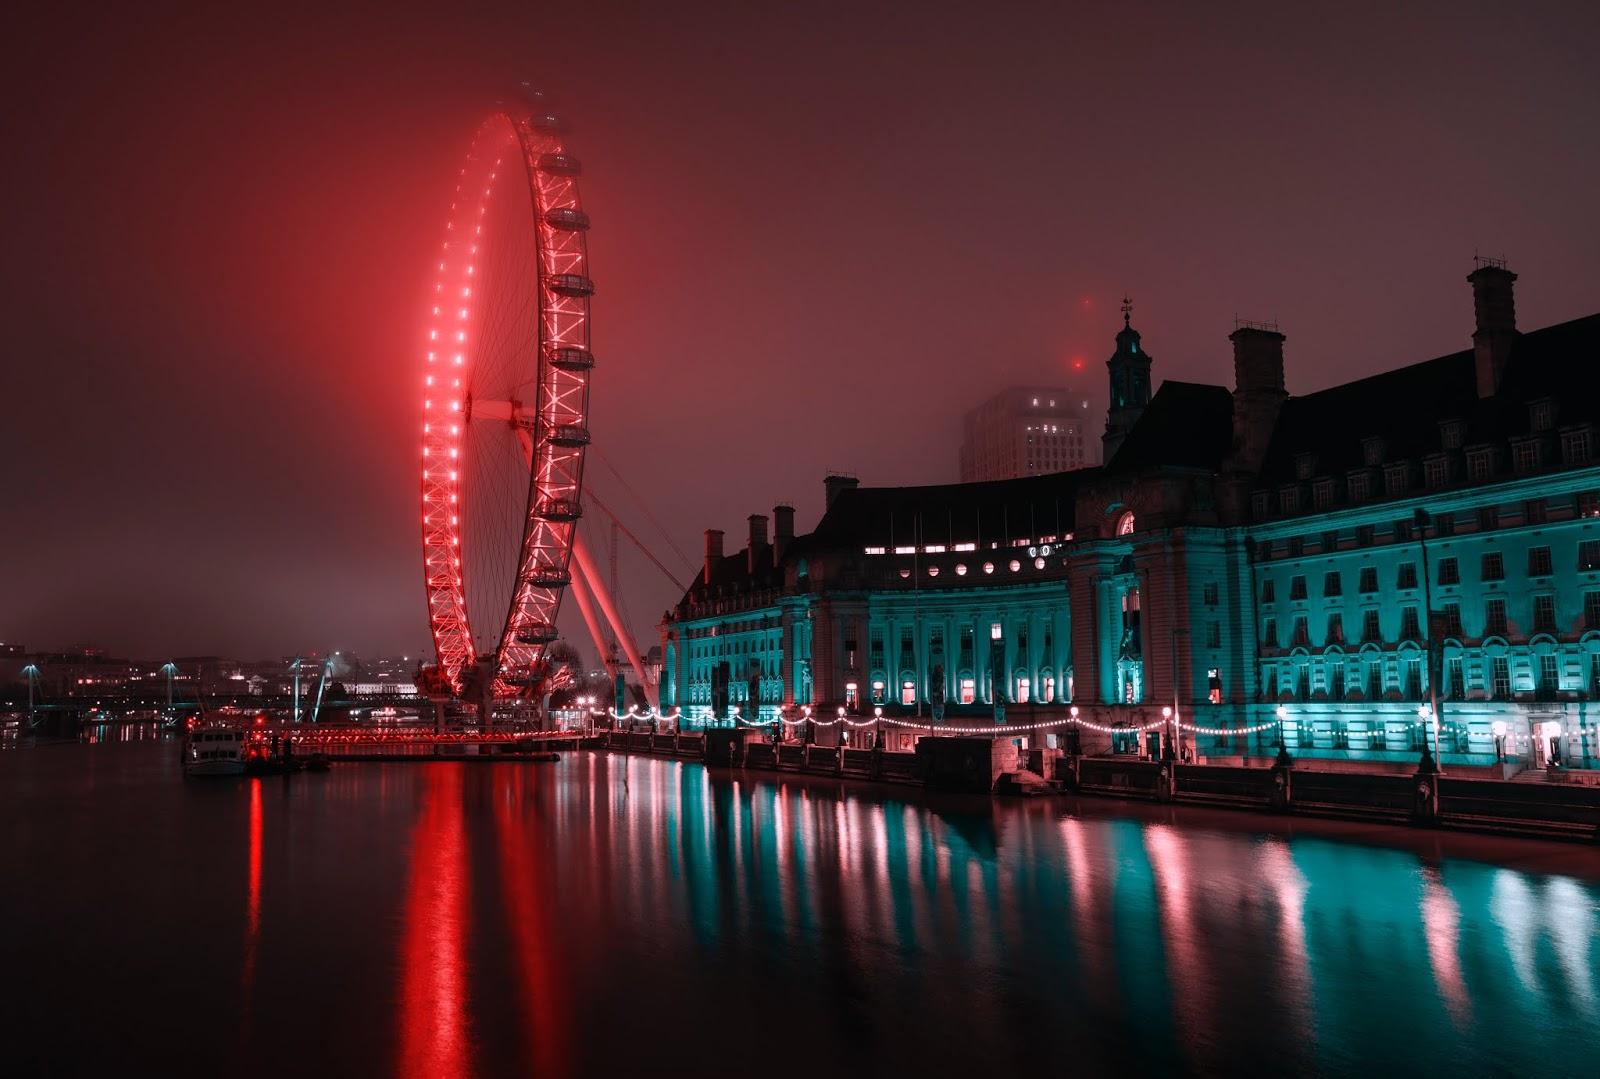 Amusement park, River Thames, Ferris Wheel, Green Neon, Night, Cityscape, World